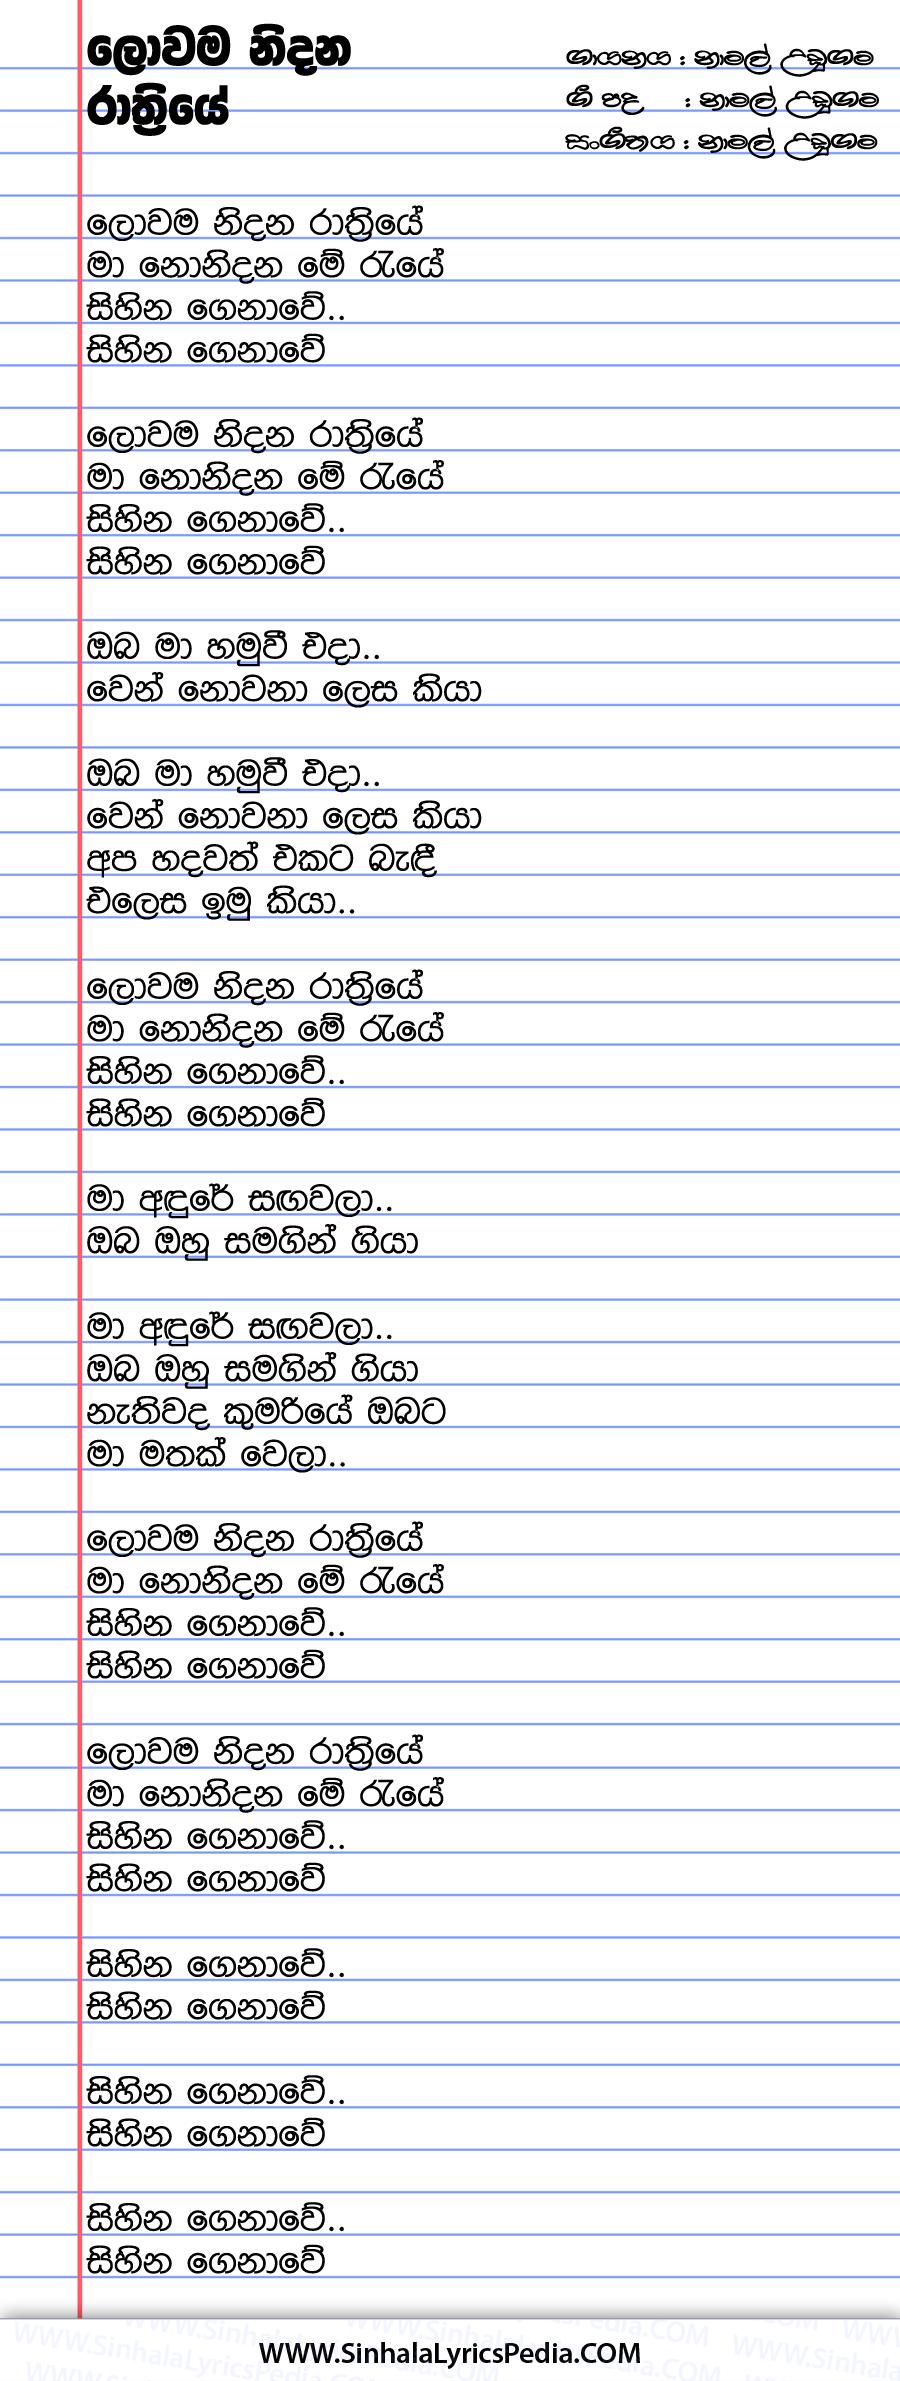 Lowama Nidana Rathriye Song Lyrics